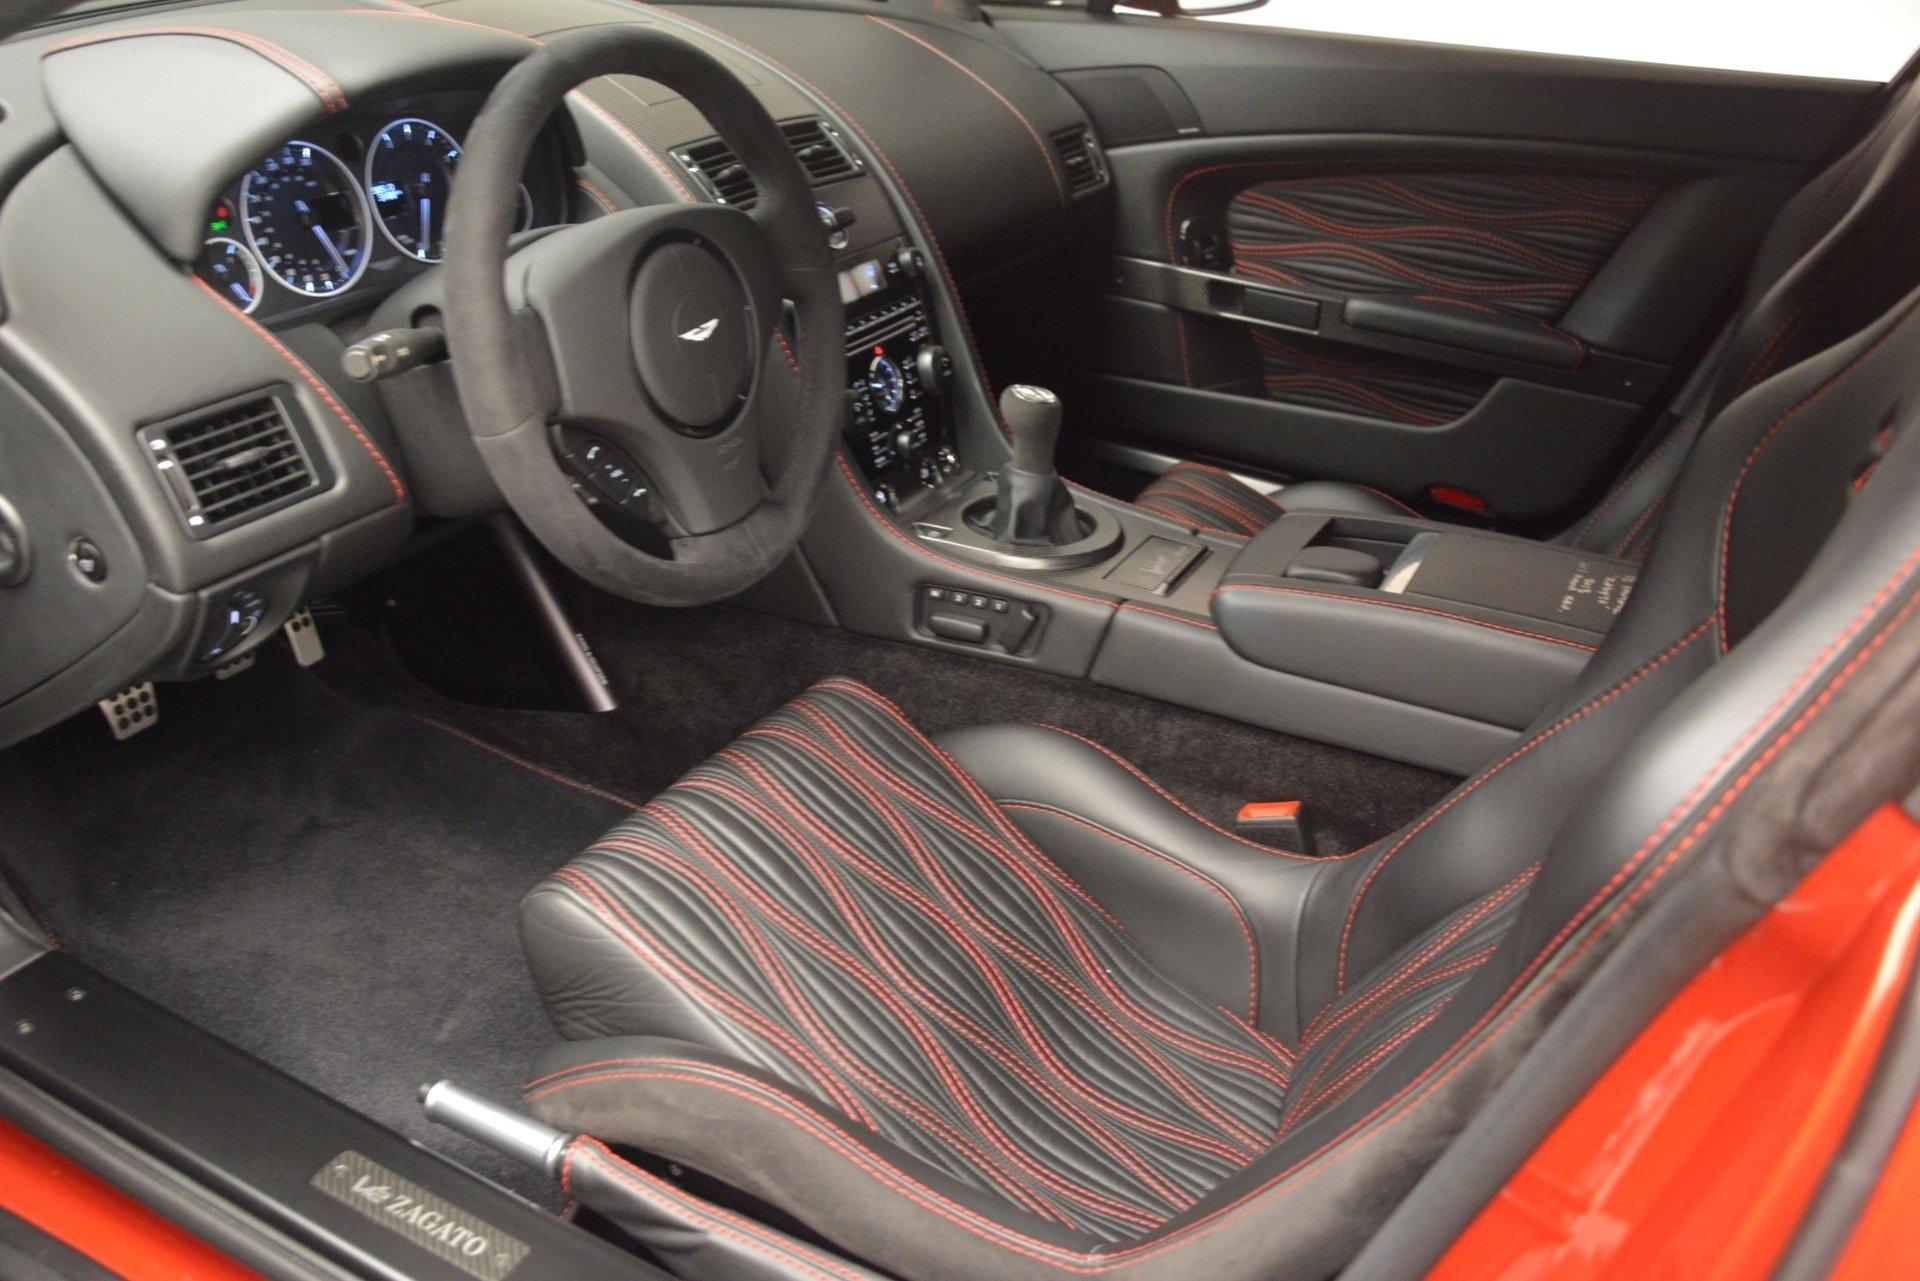 Used 2013 Aston Martin V12 Zagato Coupe For Sale In Westport, CT 3181_p13